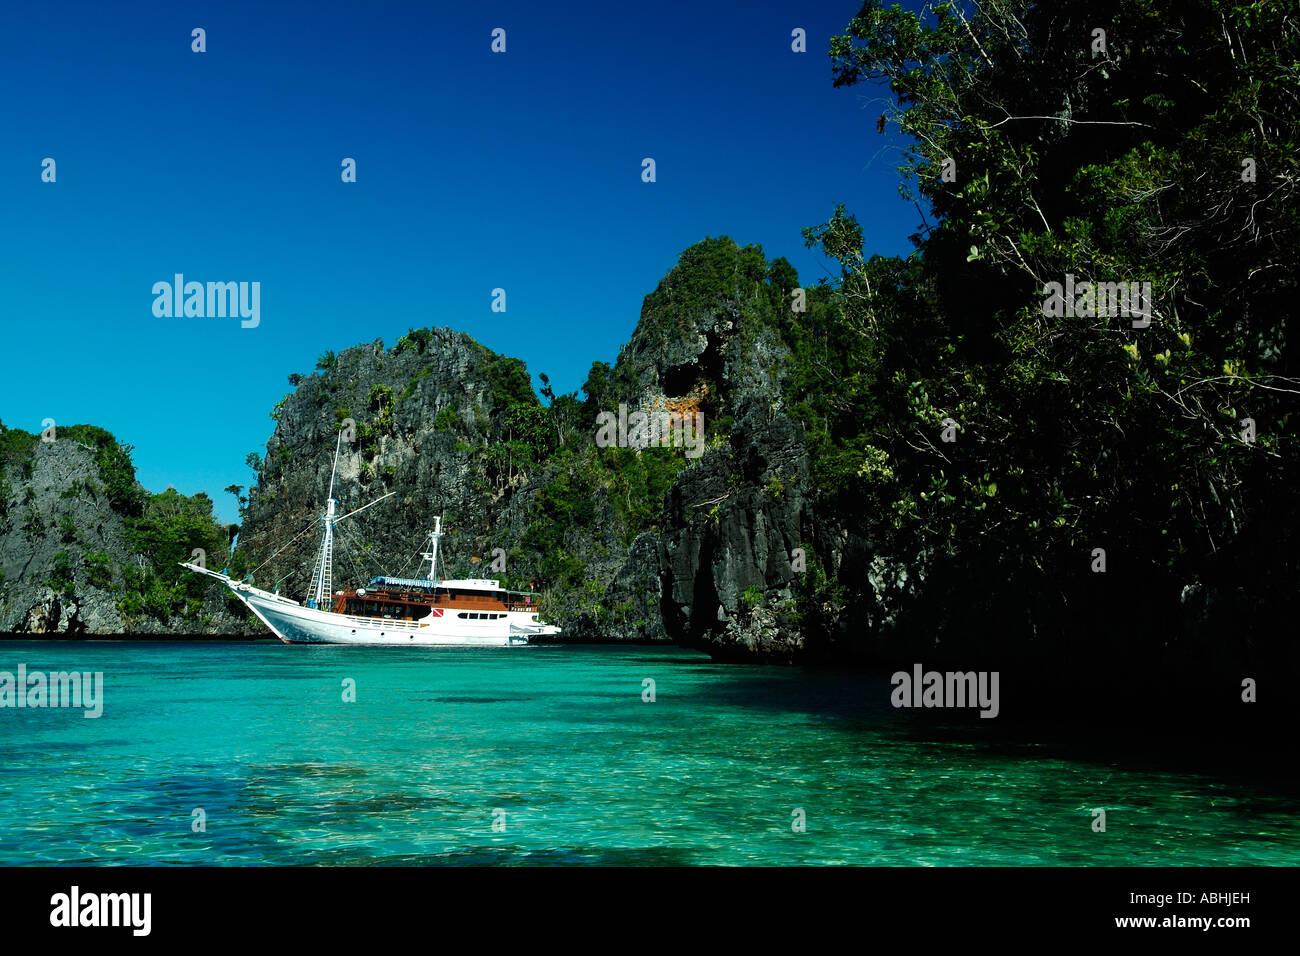 Small limestone island in Raja Ampat, Indonesia - Stock Image